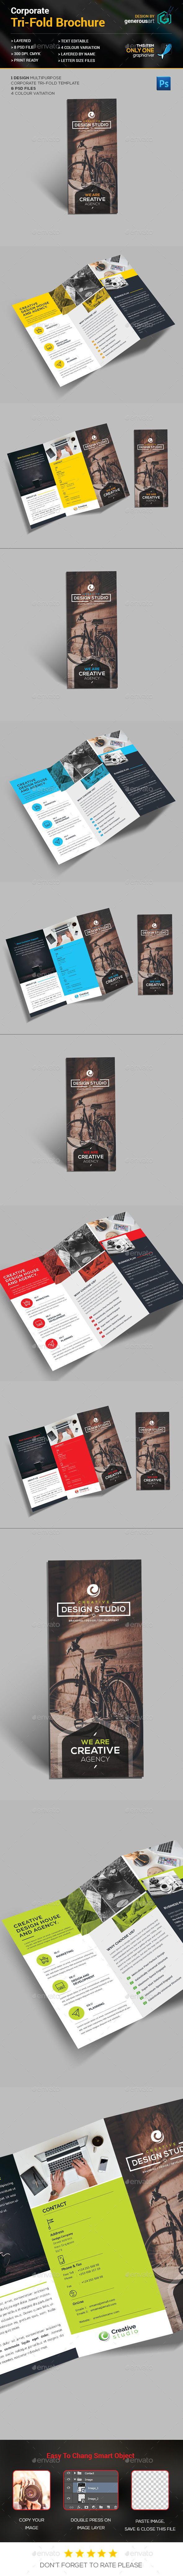 Tri-Fold Brochure Template PSD #design Download: http://graphicriver.net/item/trifold-brochure/14419718?ref=ksioks